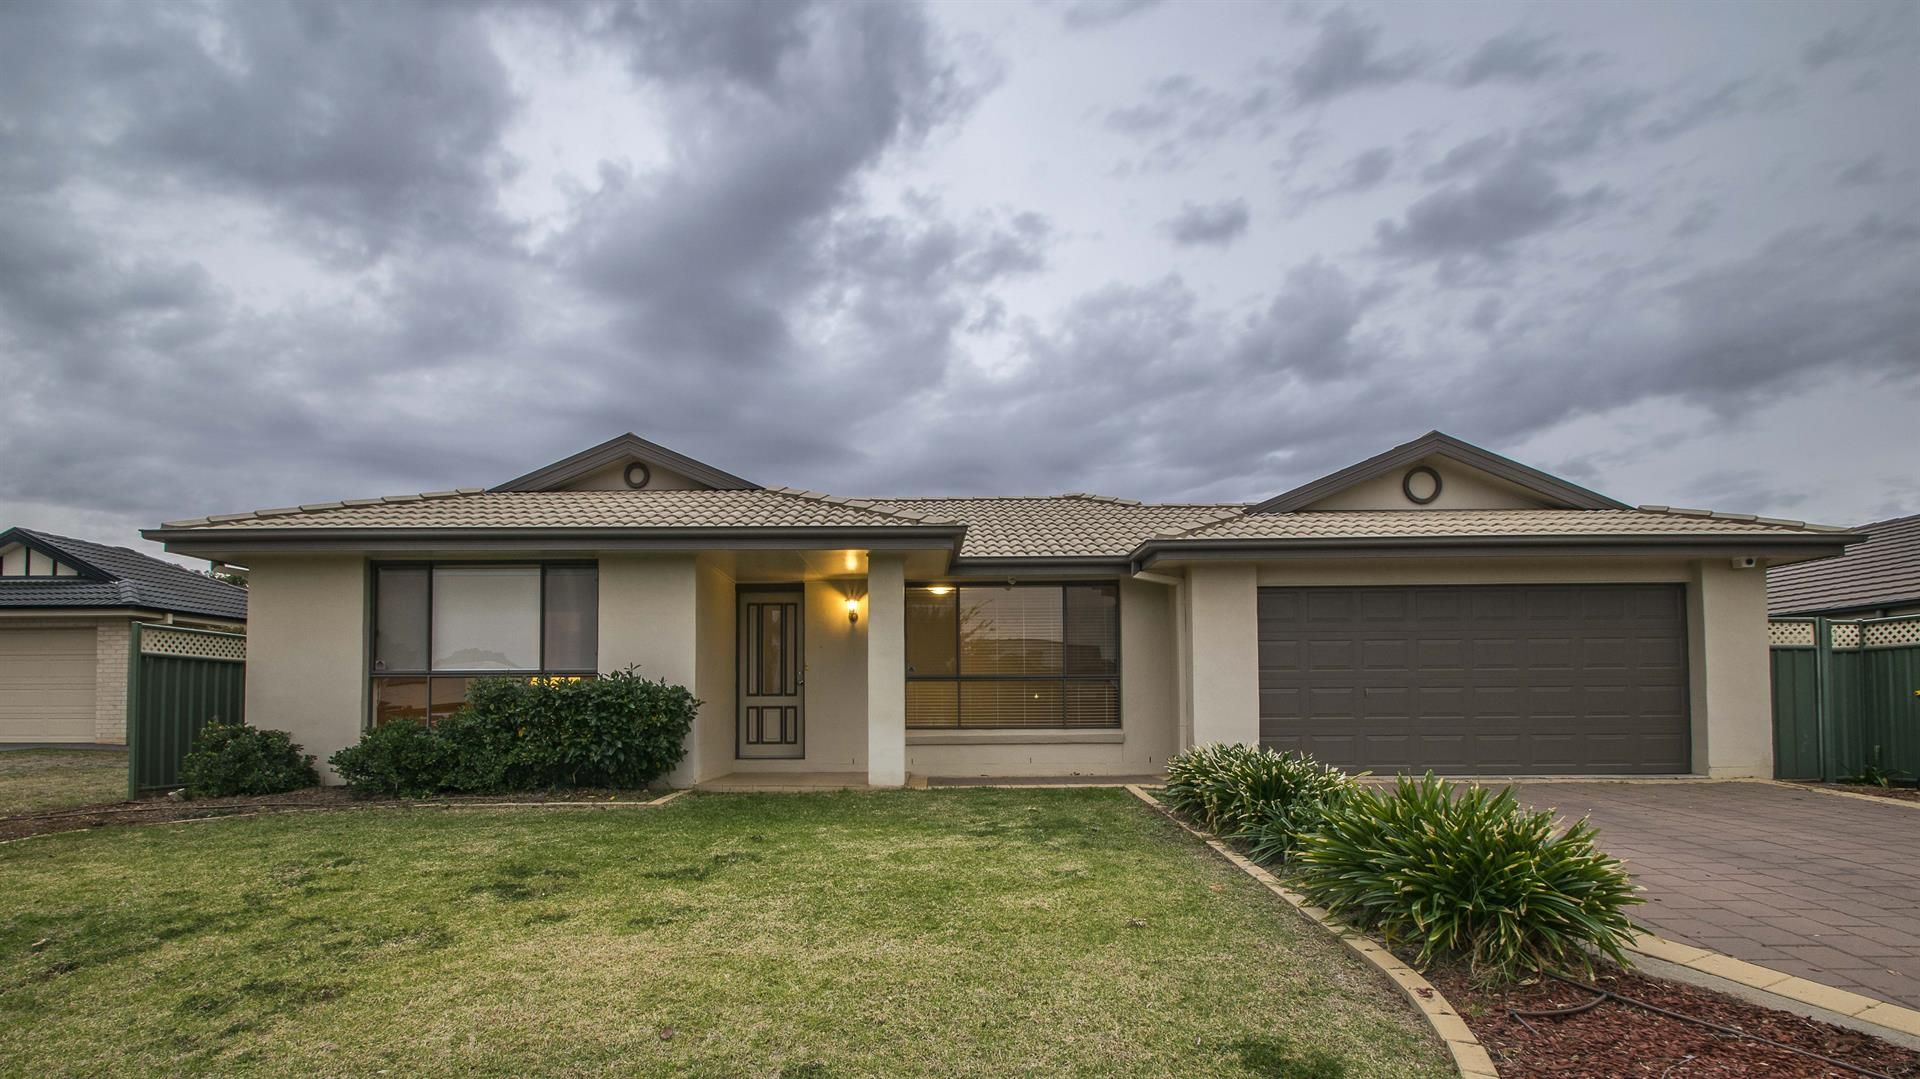 18 Ashlundie Crescent, Dubbo NSW 2830, Image 1